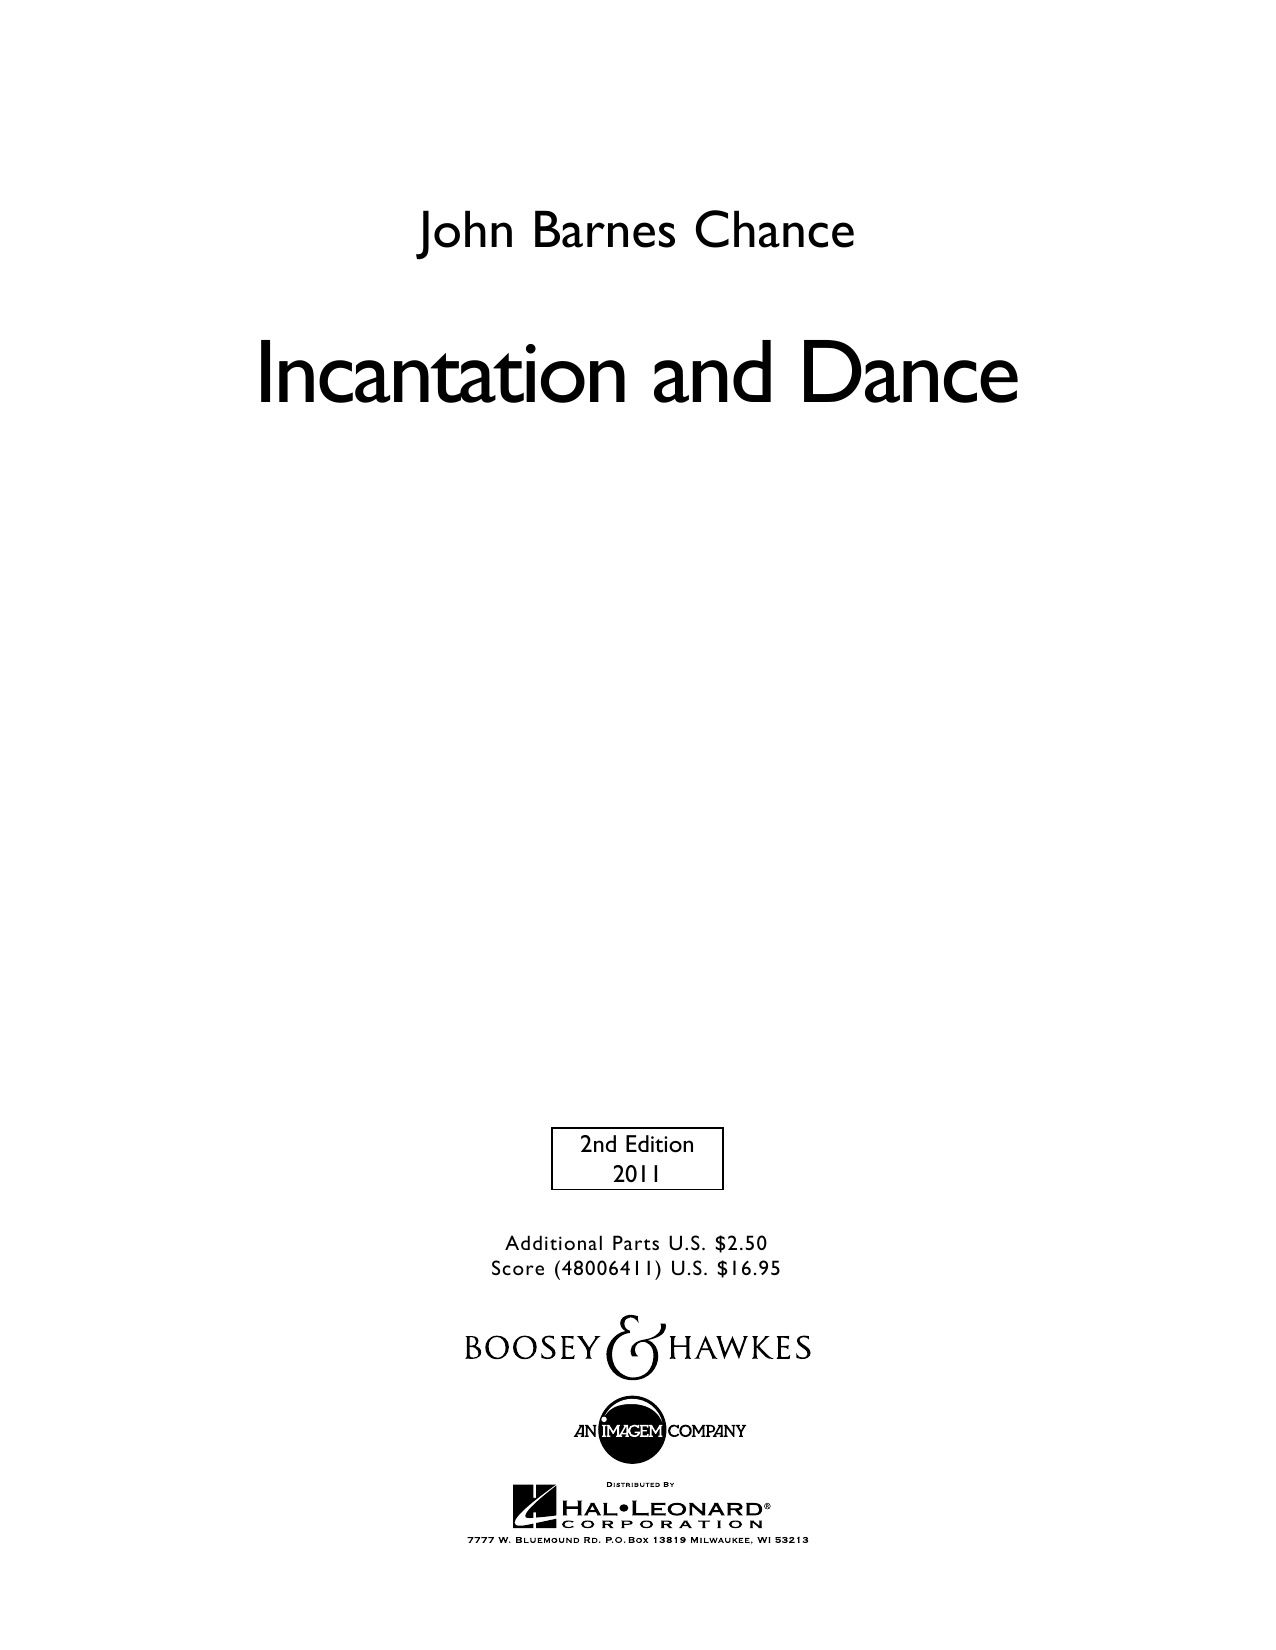 Incantation and Dance - Full Score (Concert Band)